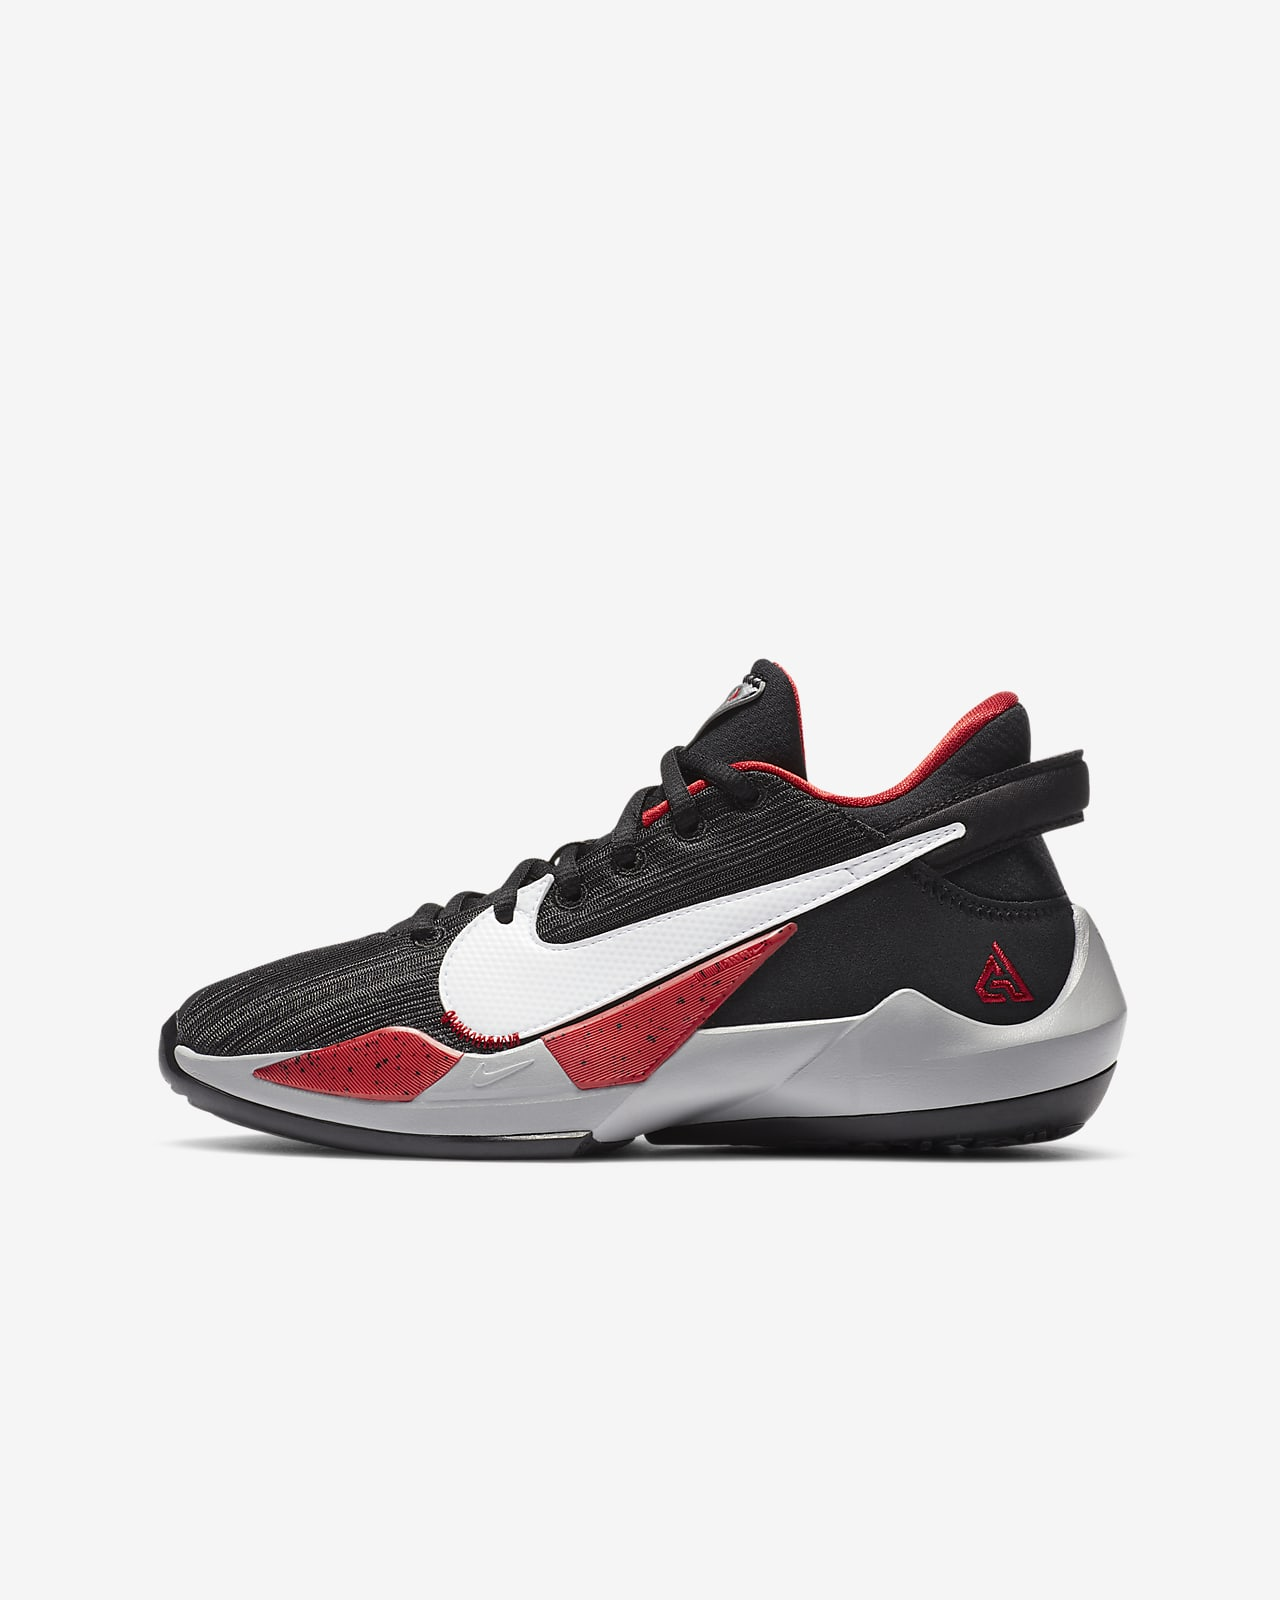 Freak 2 (GS) 大童篮球童鞋